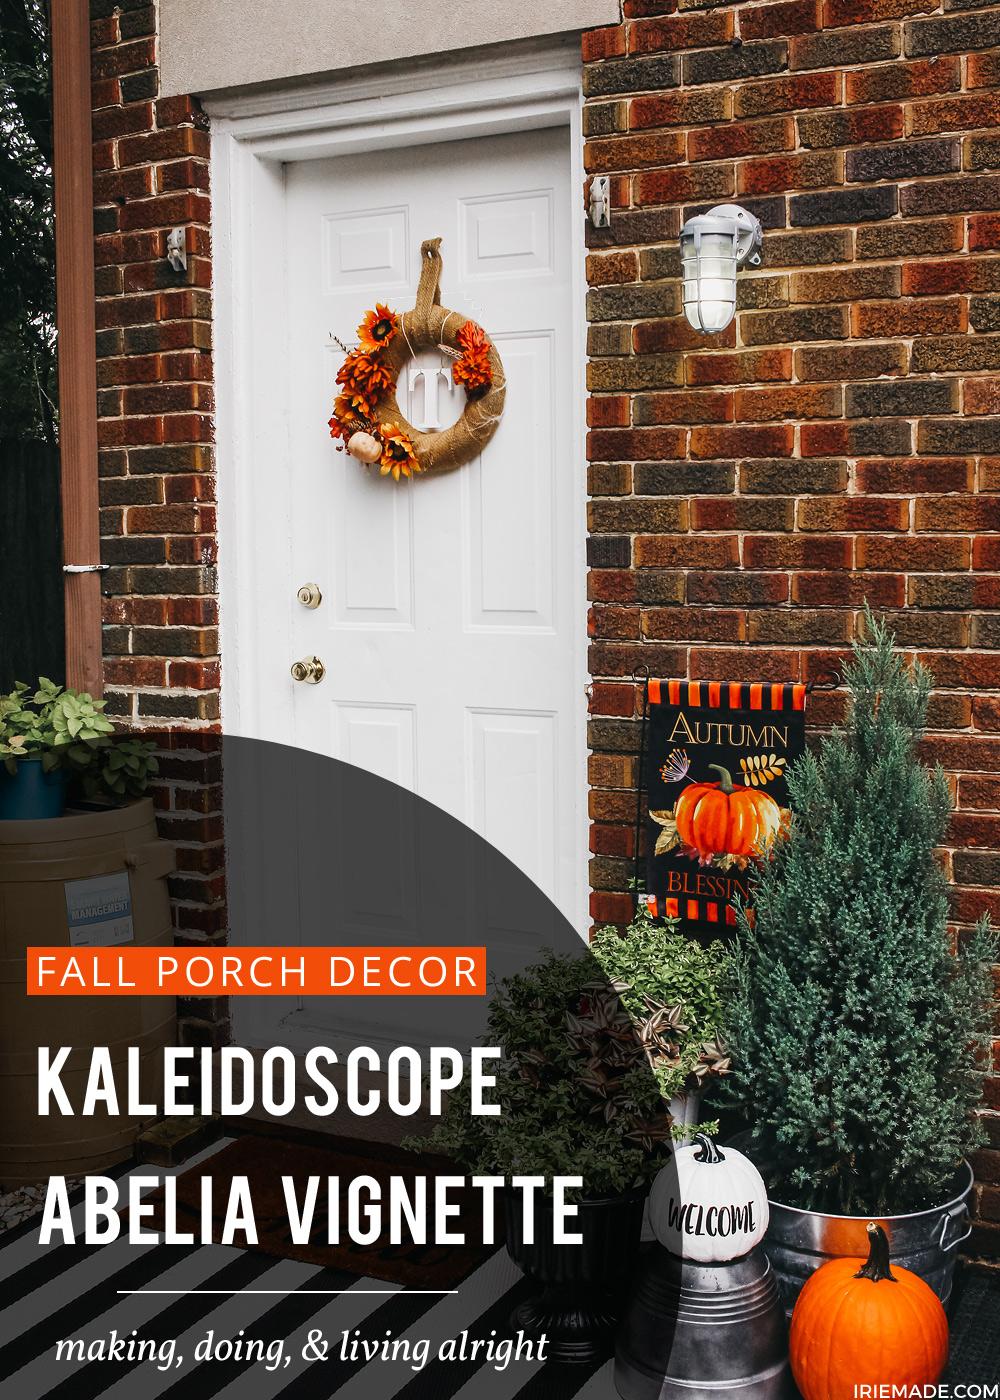 Fall Porch Decor Idea: Kaleidoscope Abelia Vignette